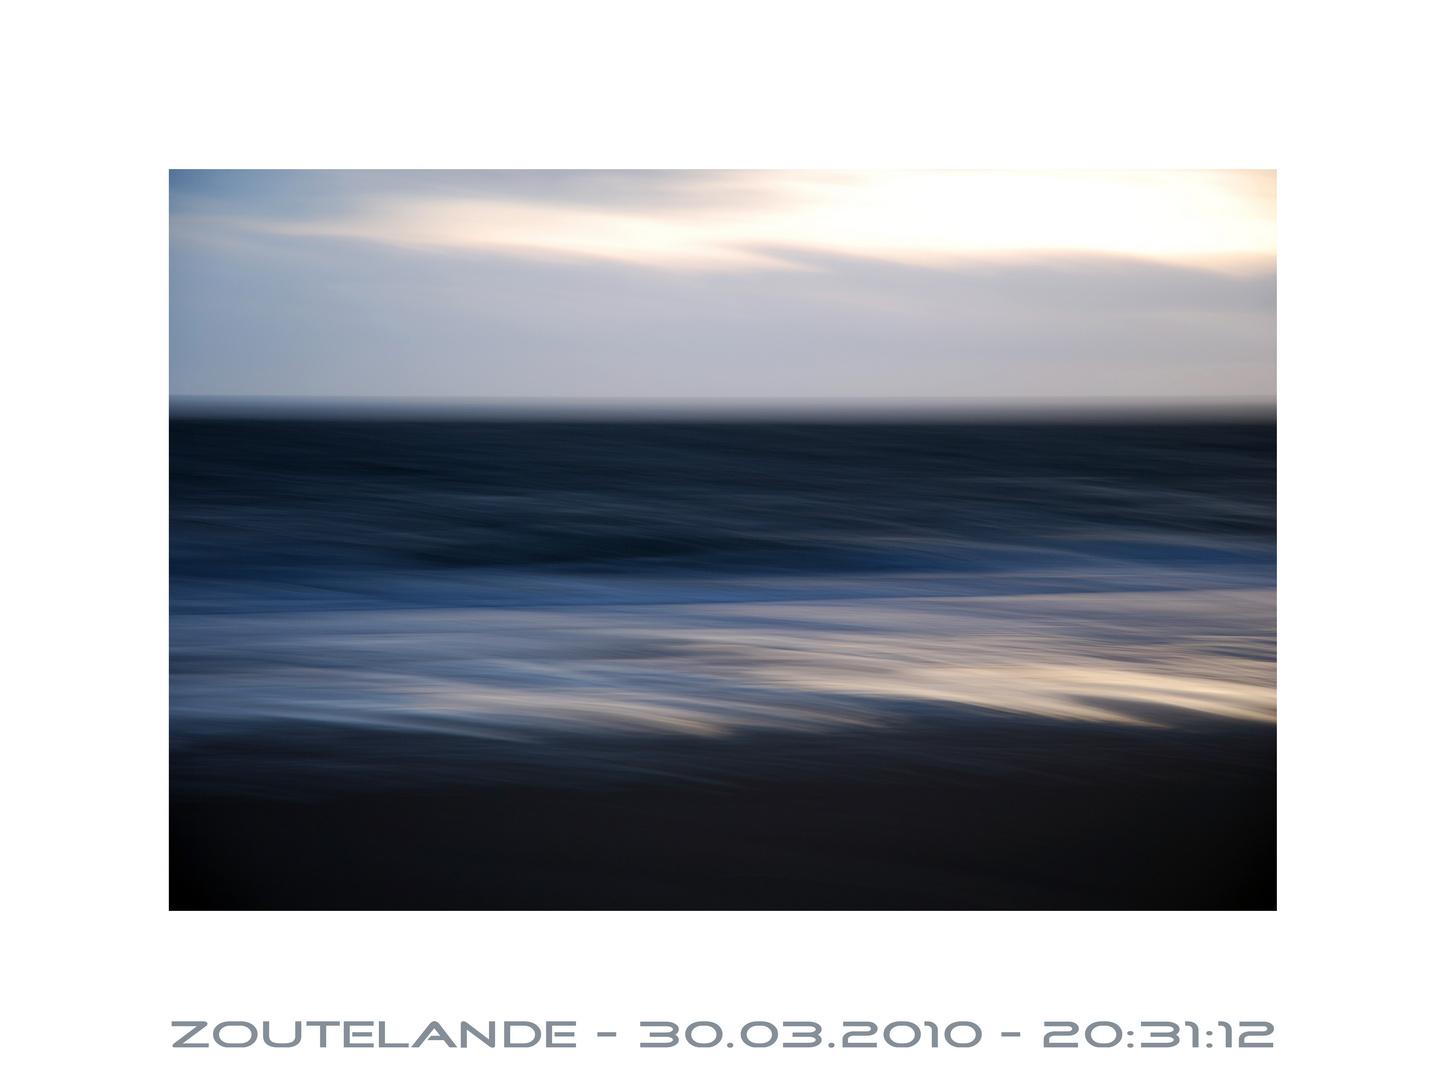 zoutelande - 30.03.2010 - 20:30:31